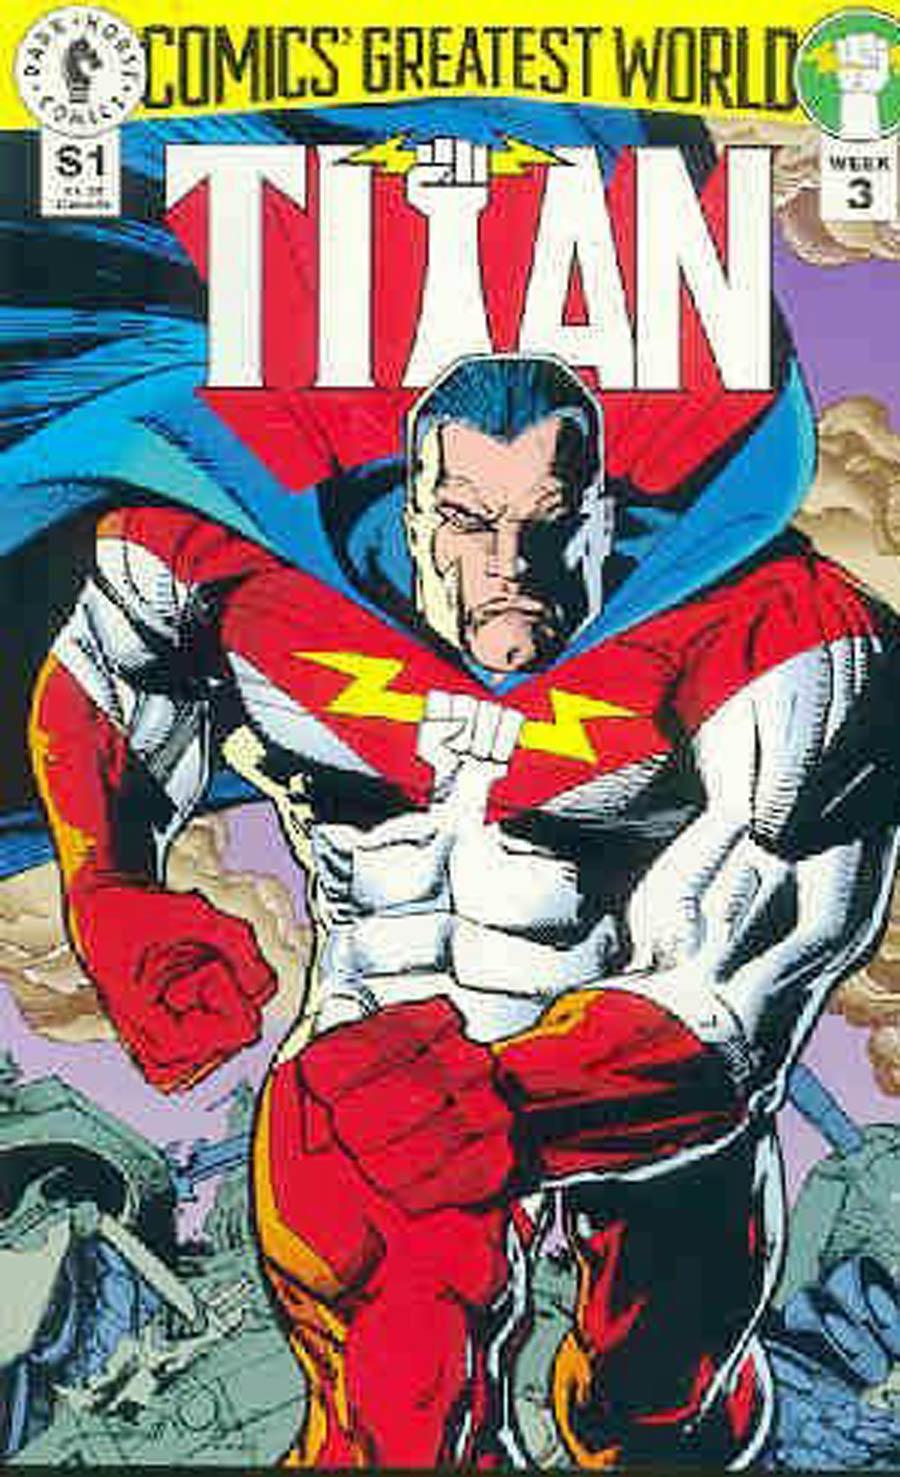 Comics Greatest World Golden City Week #3 Titan